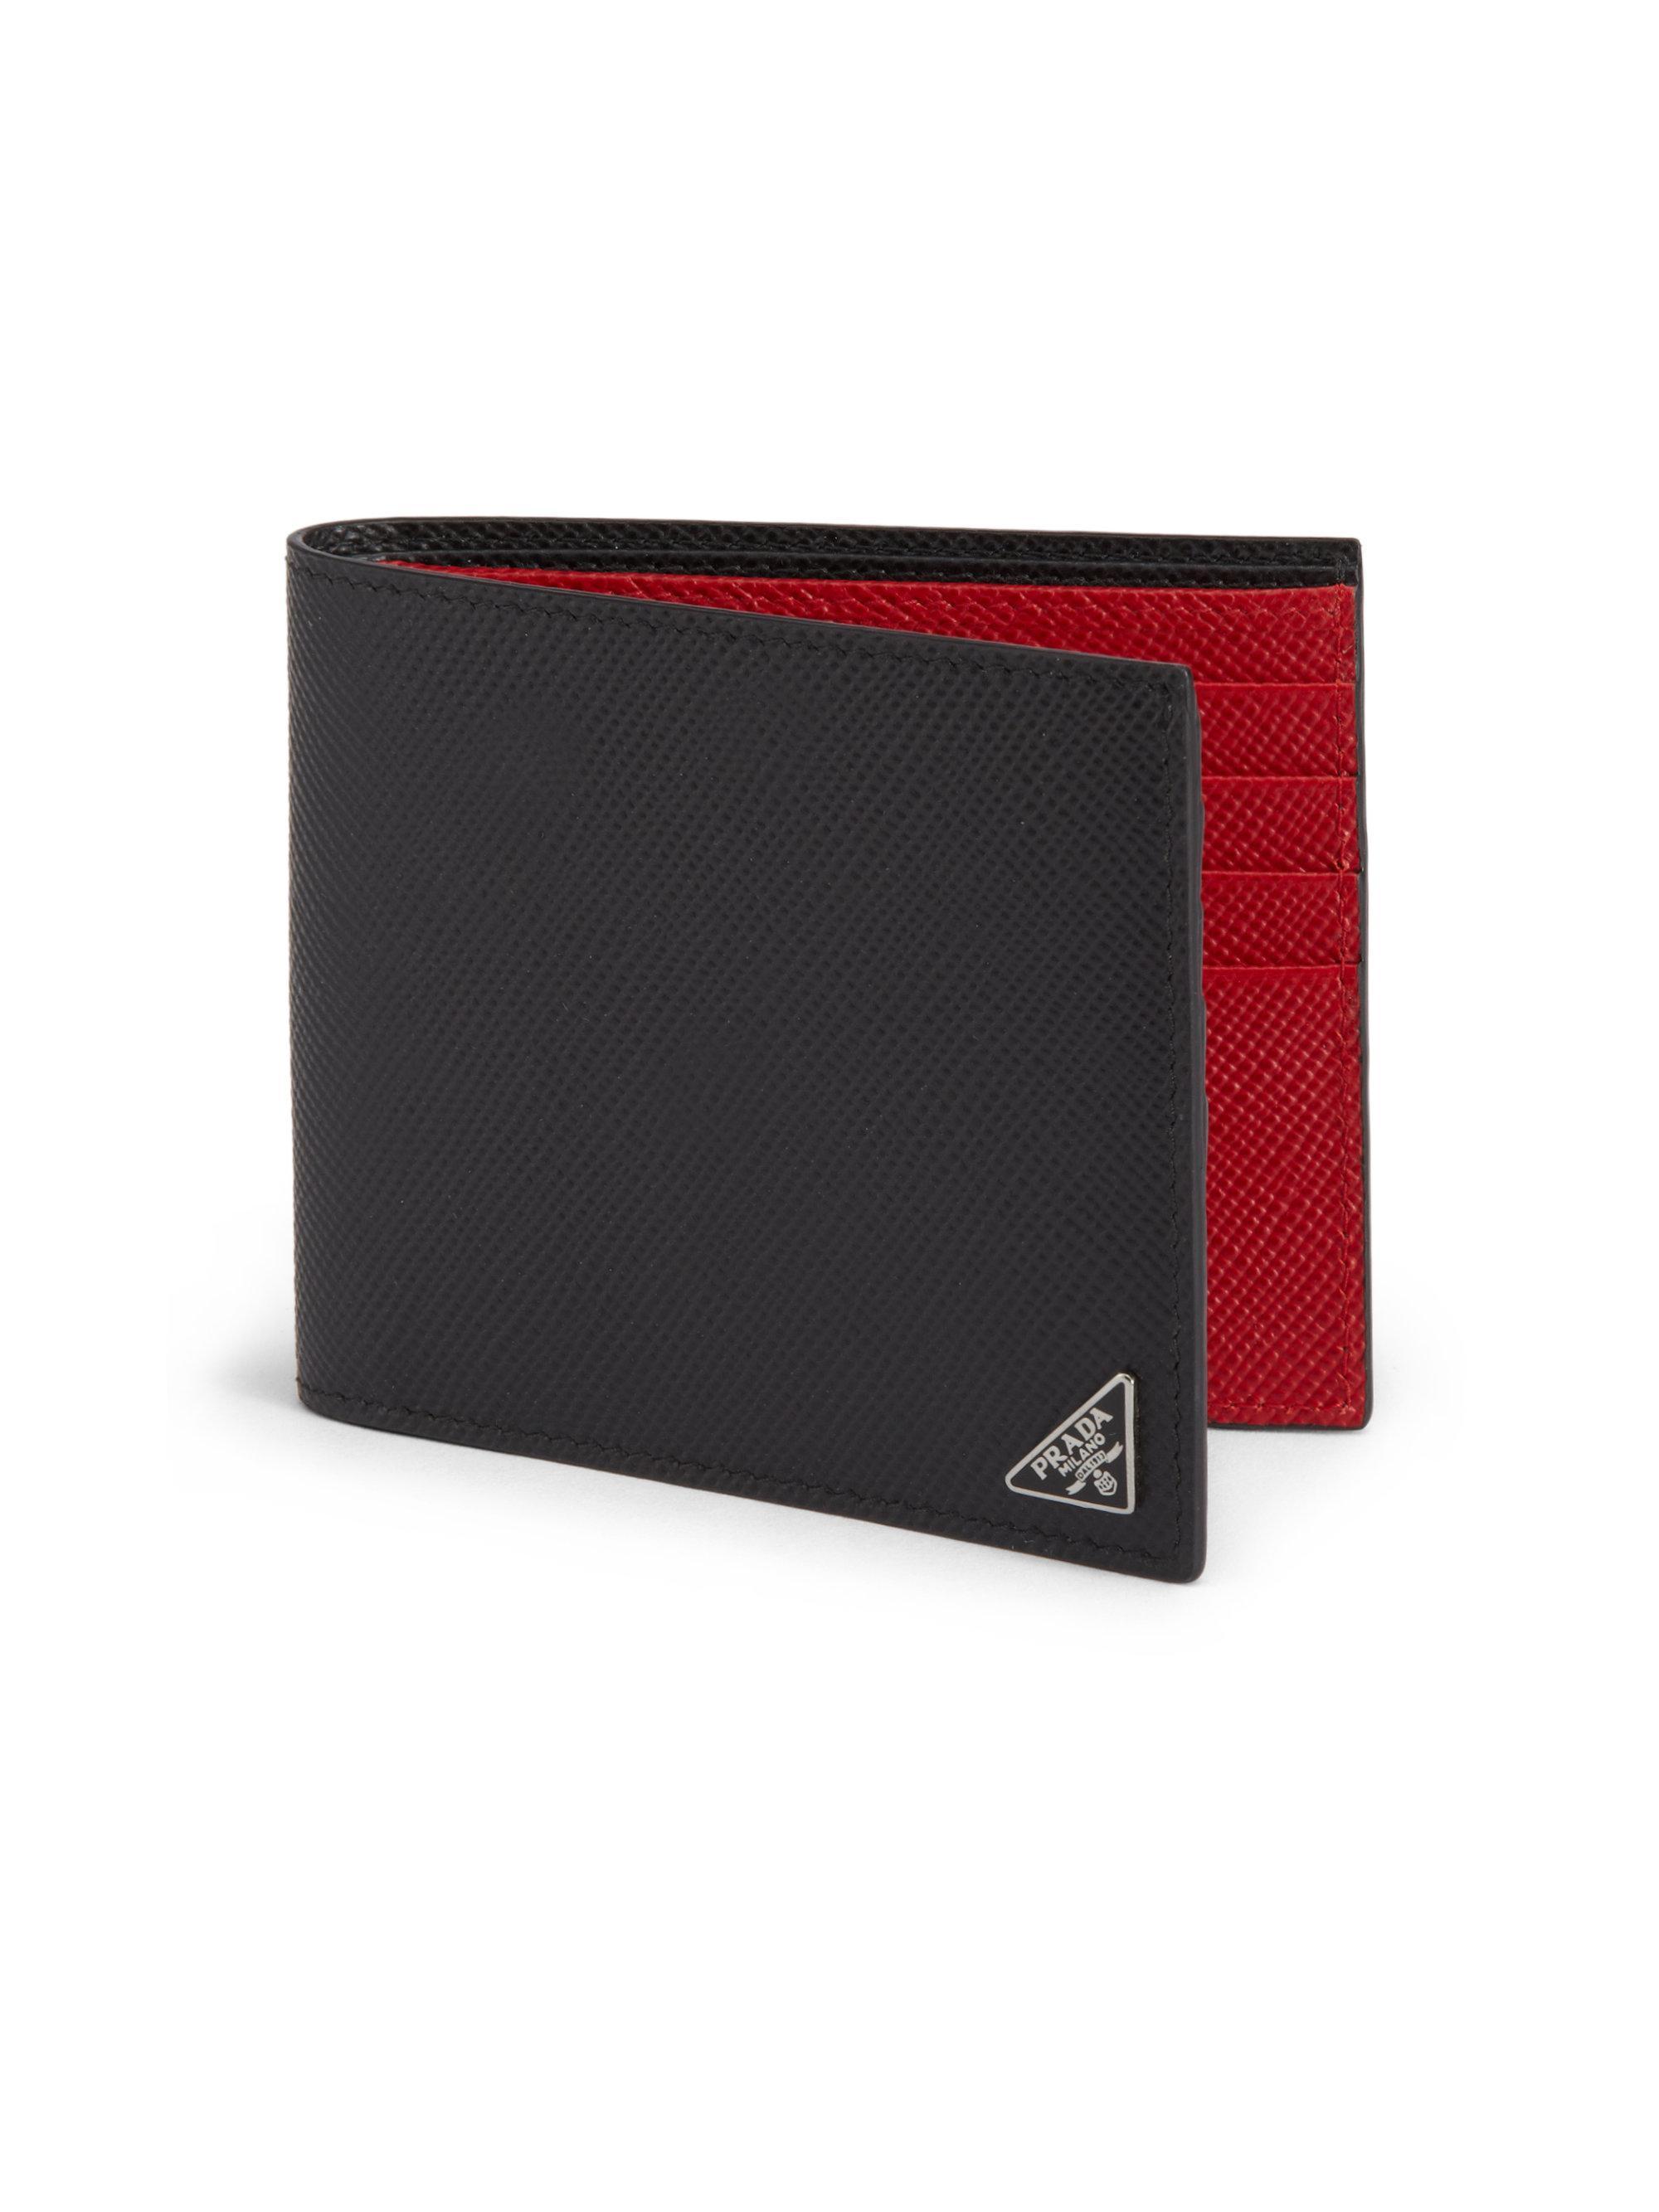 8e40b0714c5b ... aliexpress lyst prada saffiano cuir billfold wallet in black for men  47719 b99e0